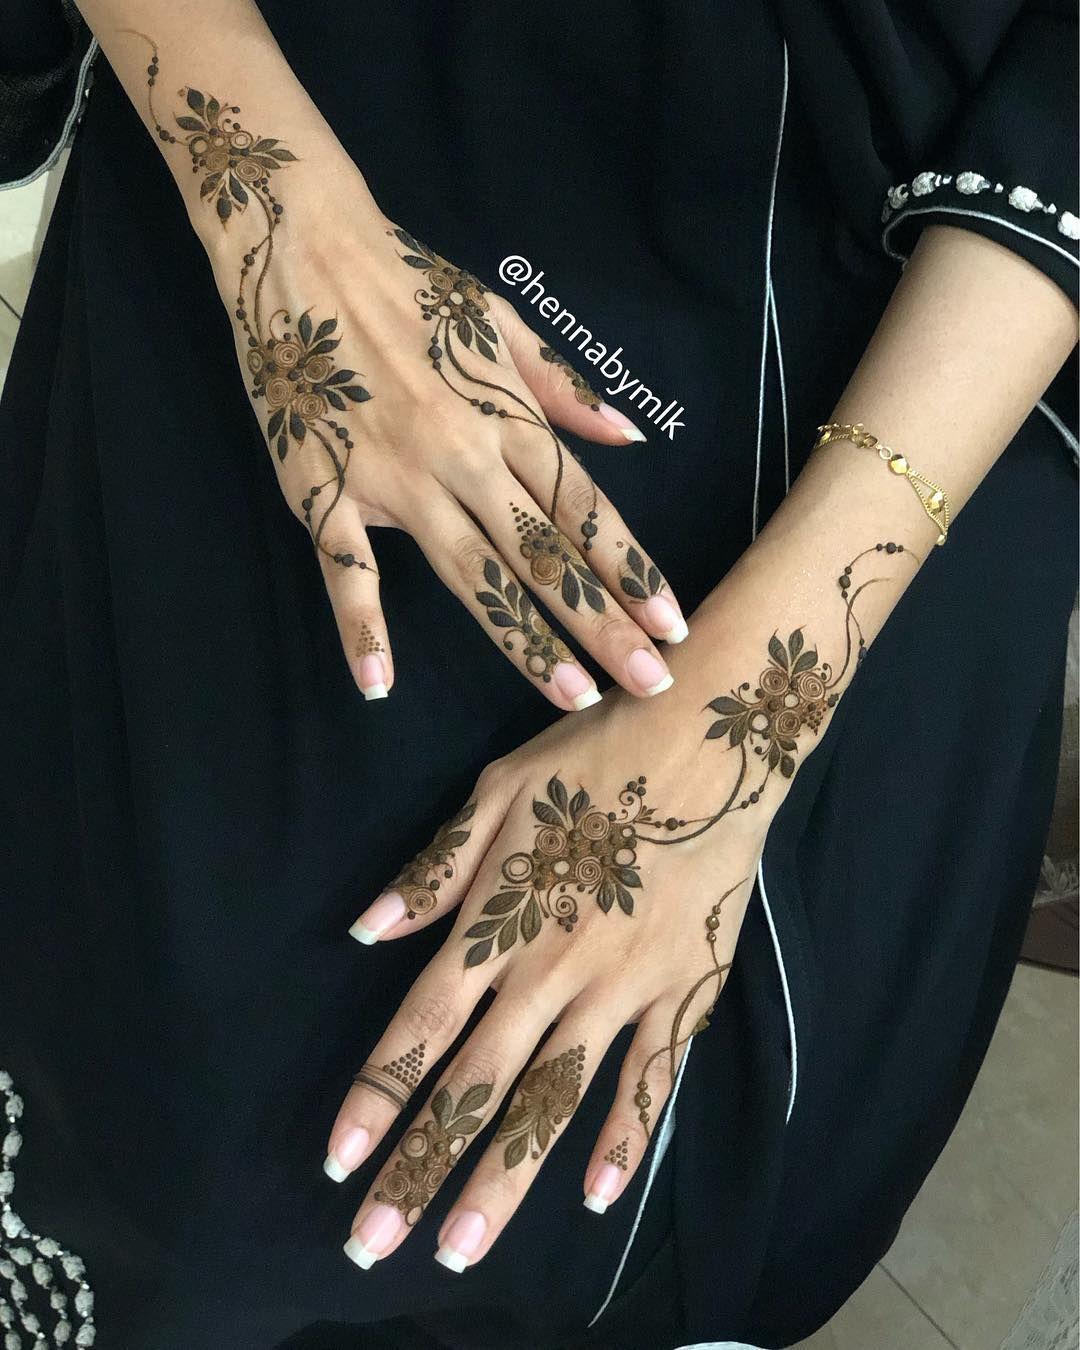 Malak Alriyami On Instagram ما شاء الله حنا حناء نقش نقش عرايس نقوشات نقوشات حن Hand Henna Henna Designs Hand Henna Designs